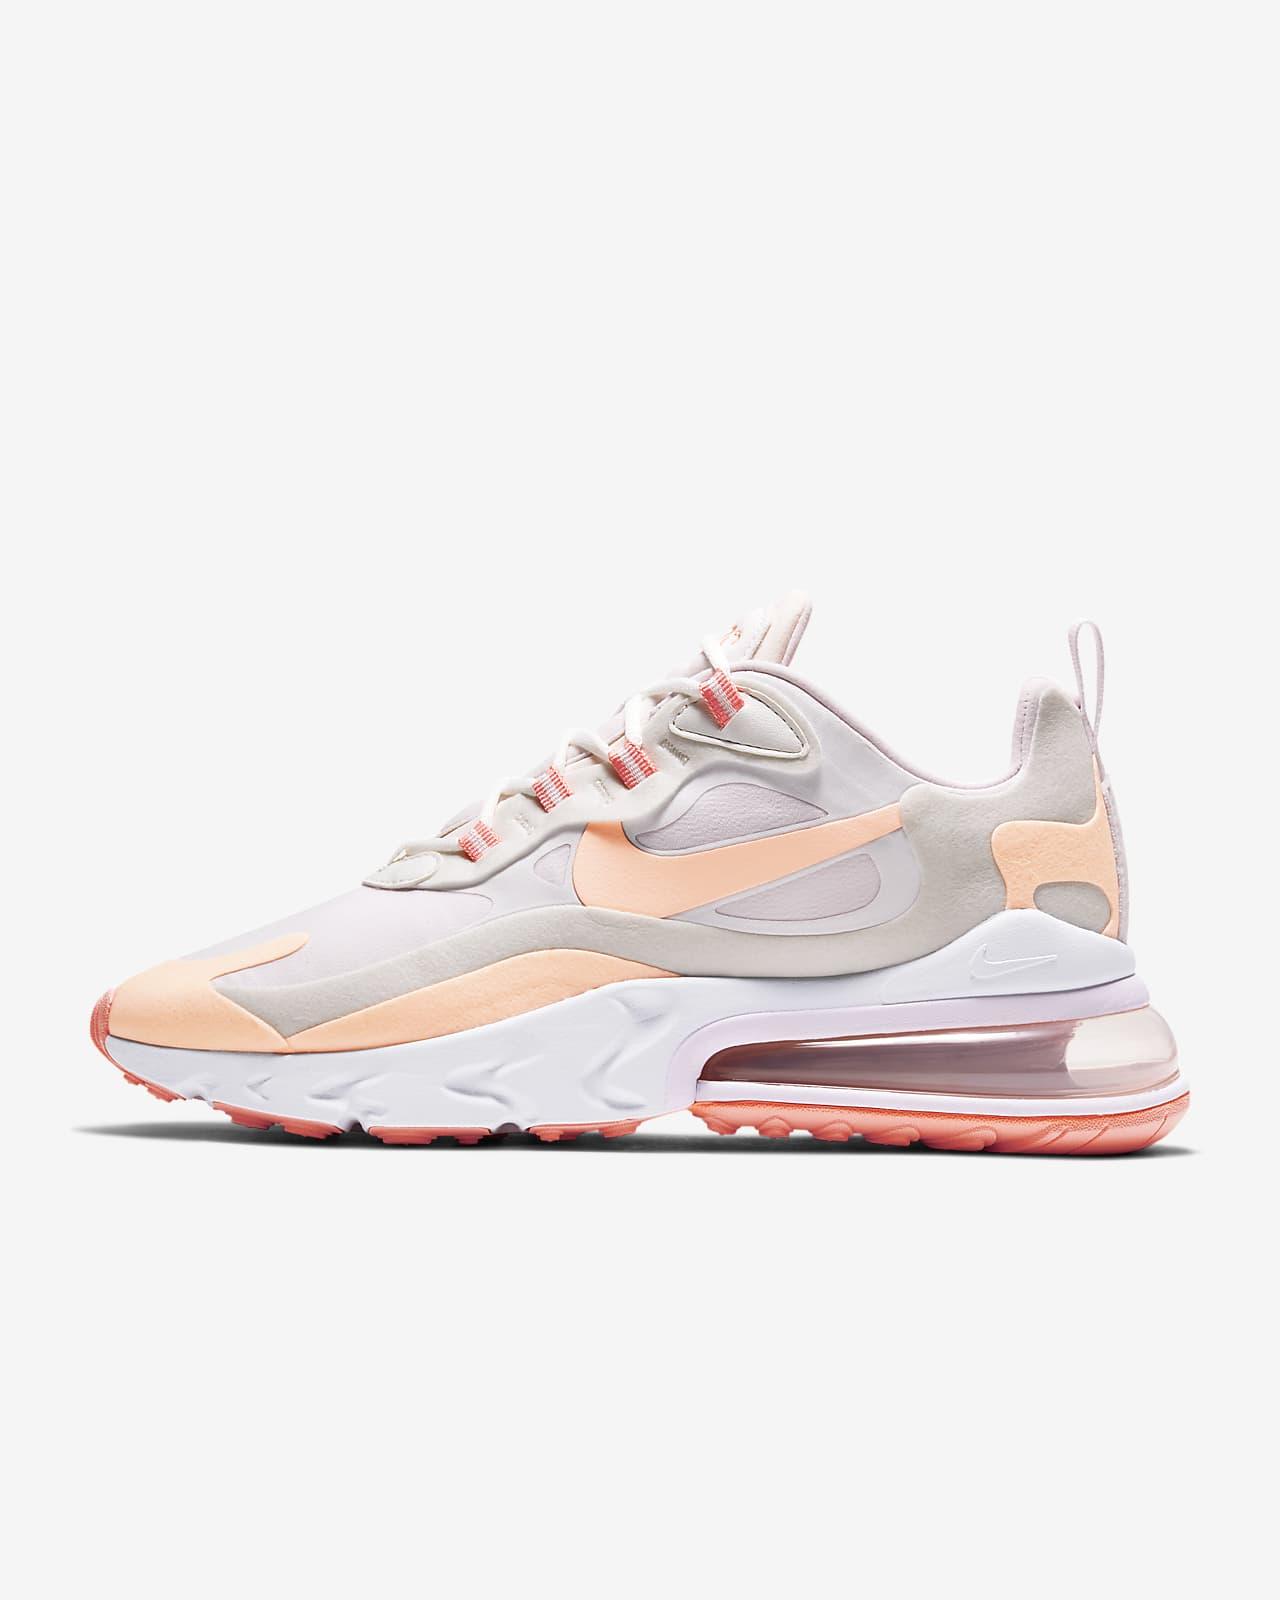 sneakers femme nike air max 270